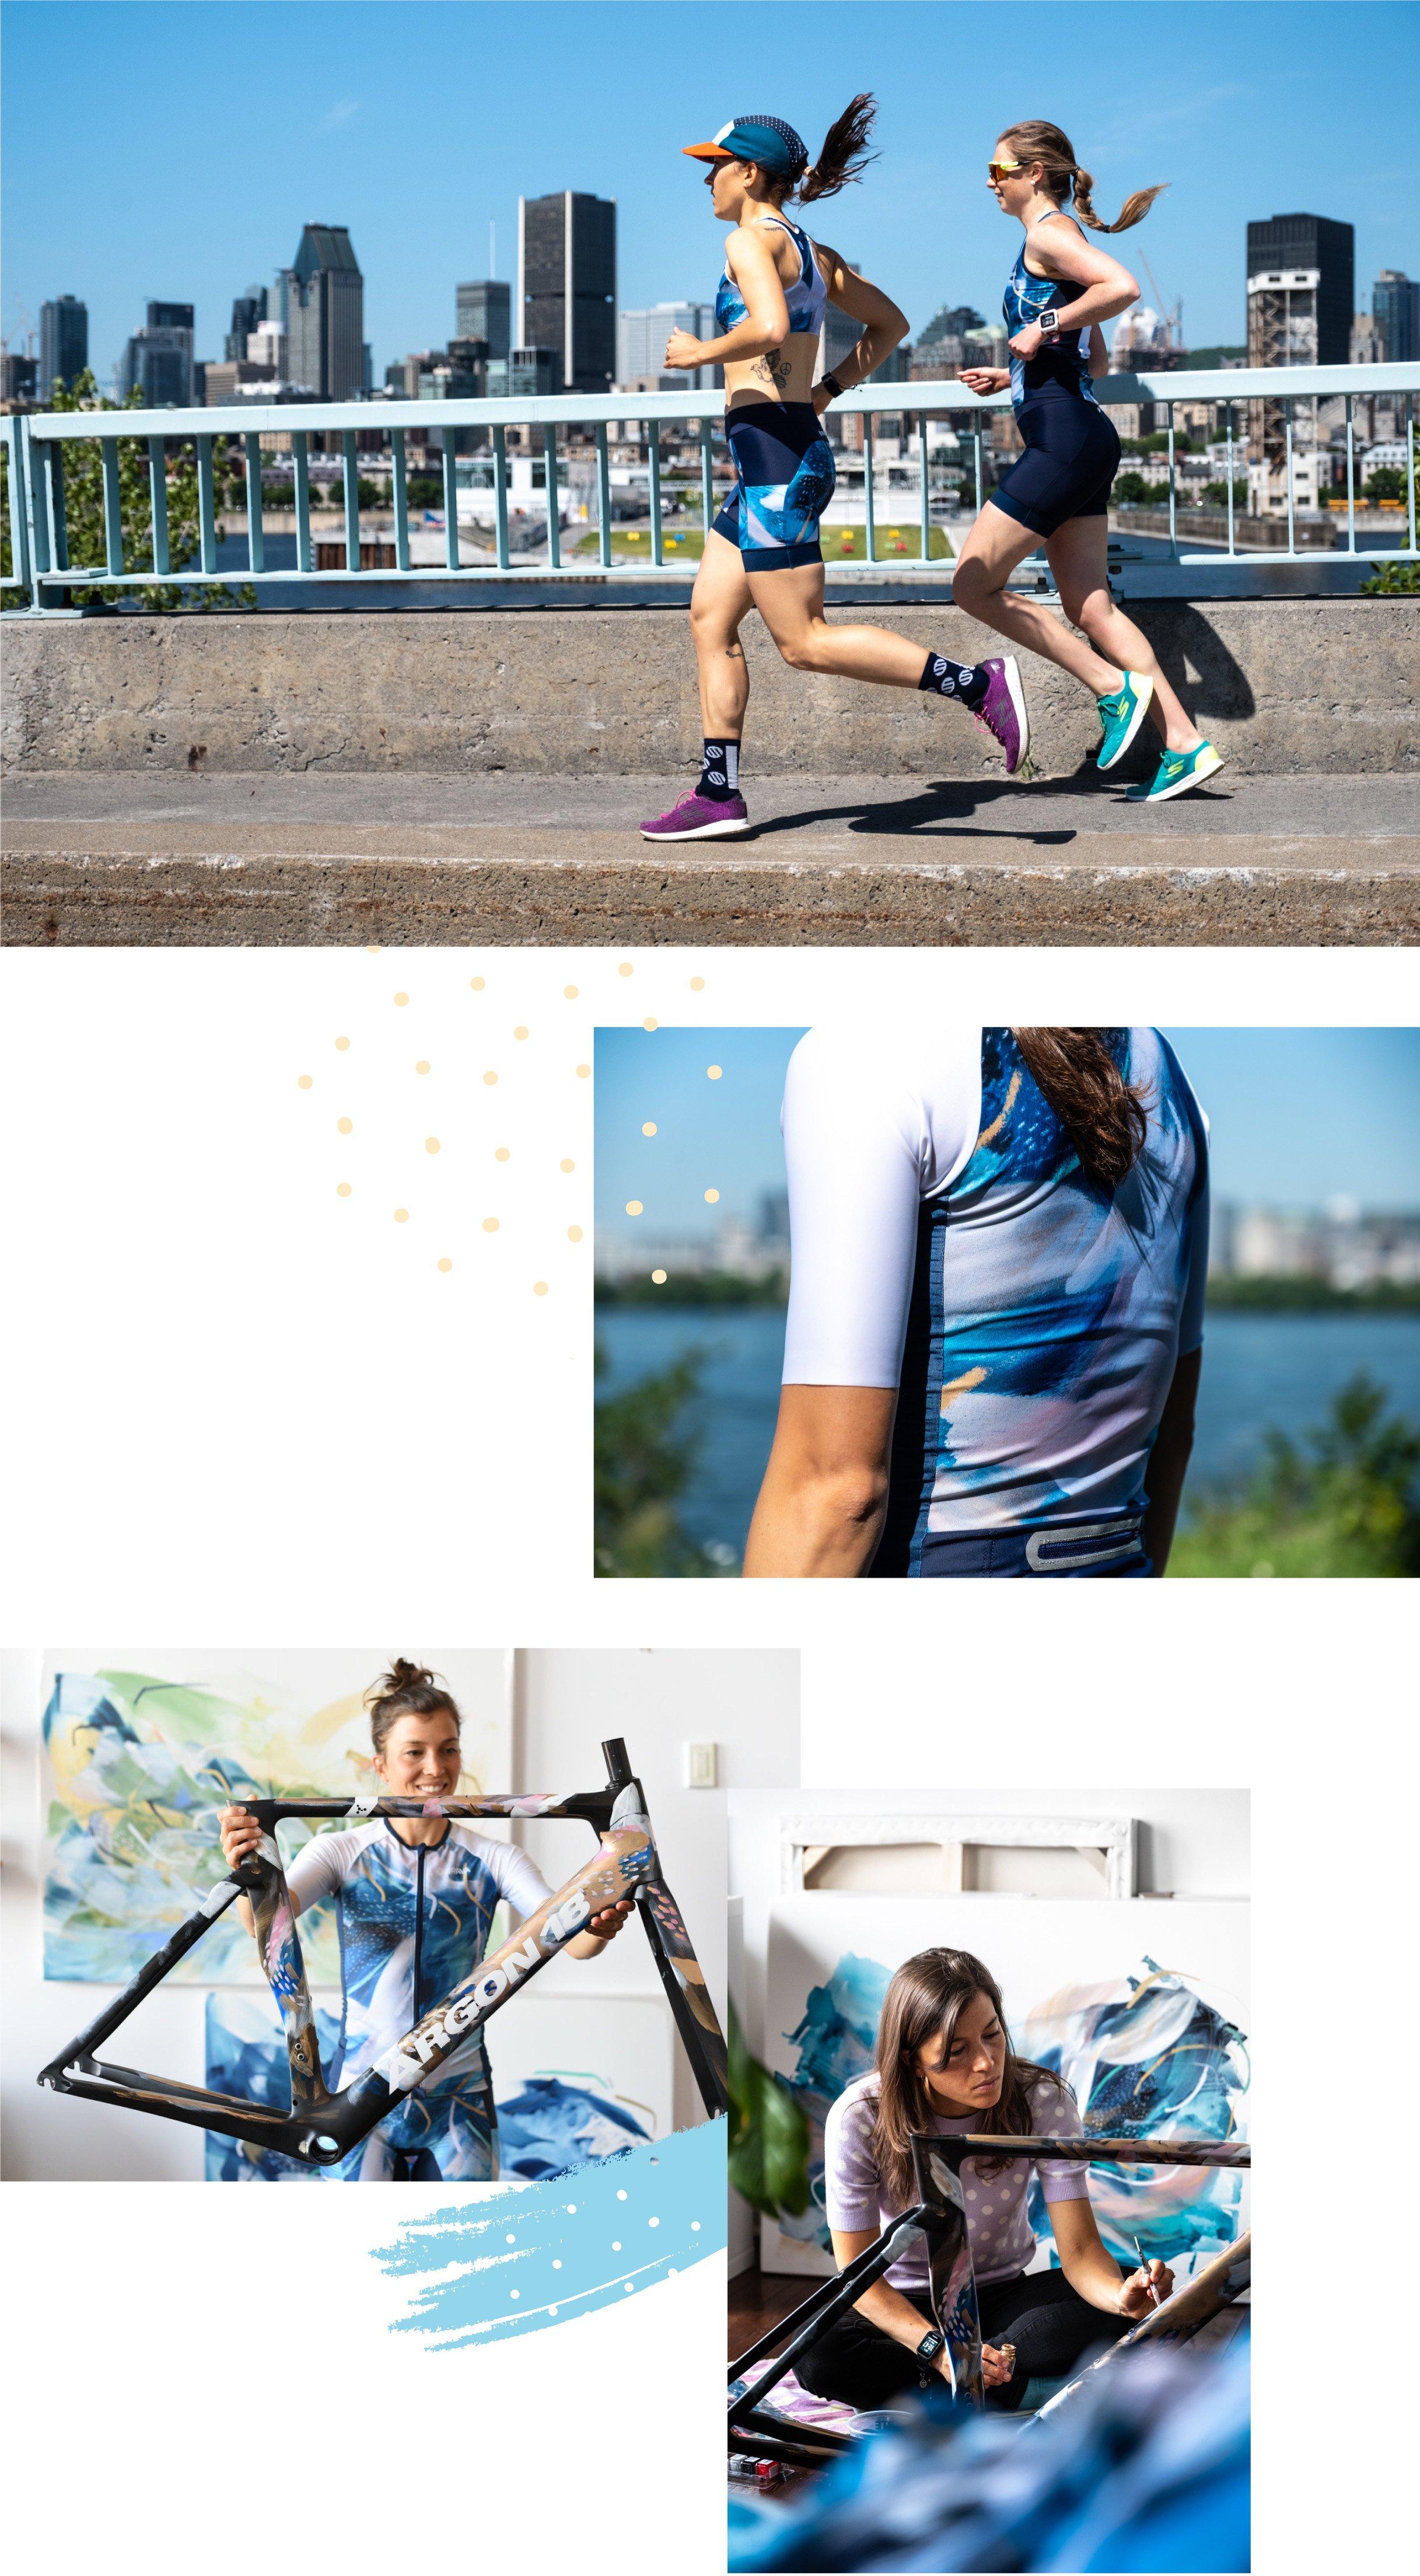 Collaboration with Brava Triathlon & Argon 18